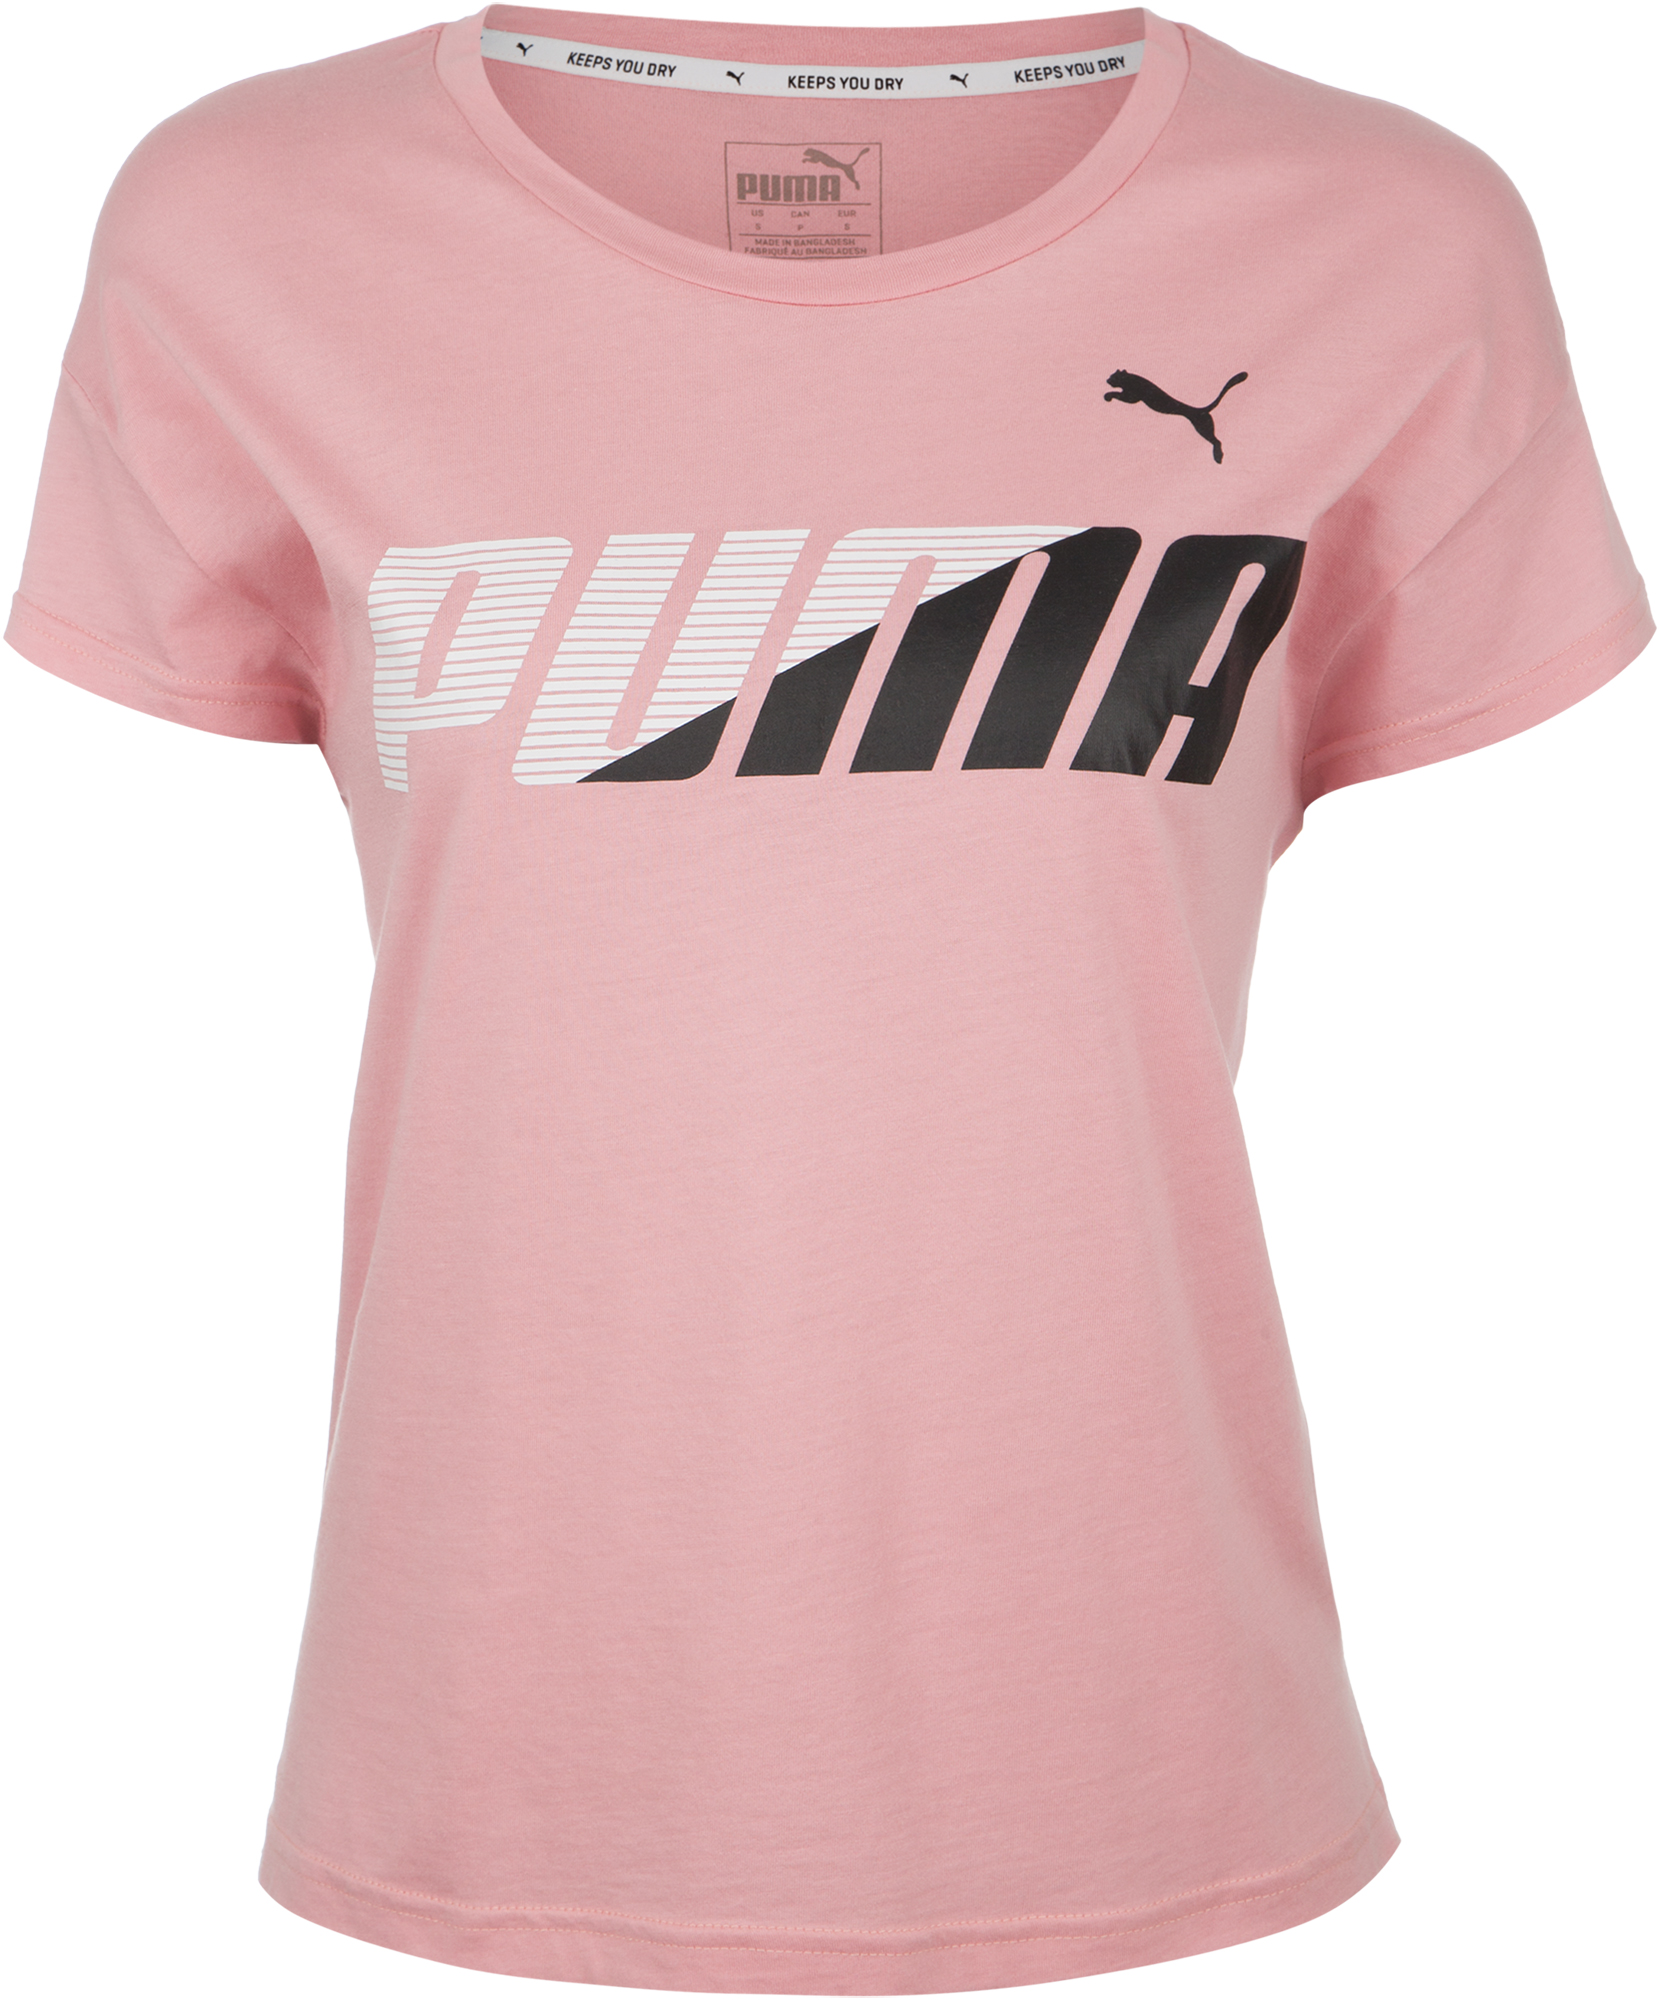 PUMA Футболка женская Puma Graphic, размер 40-42